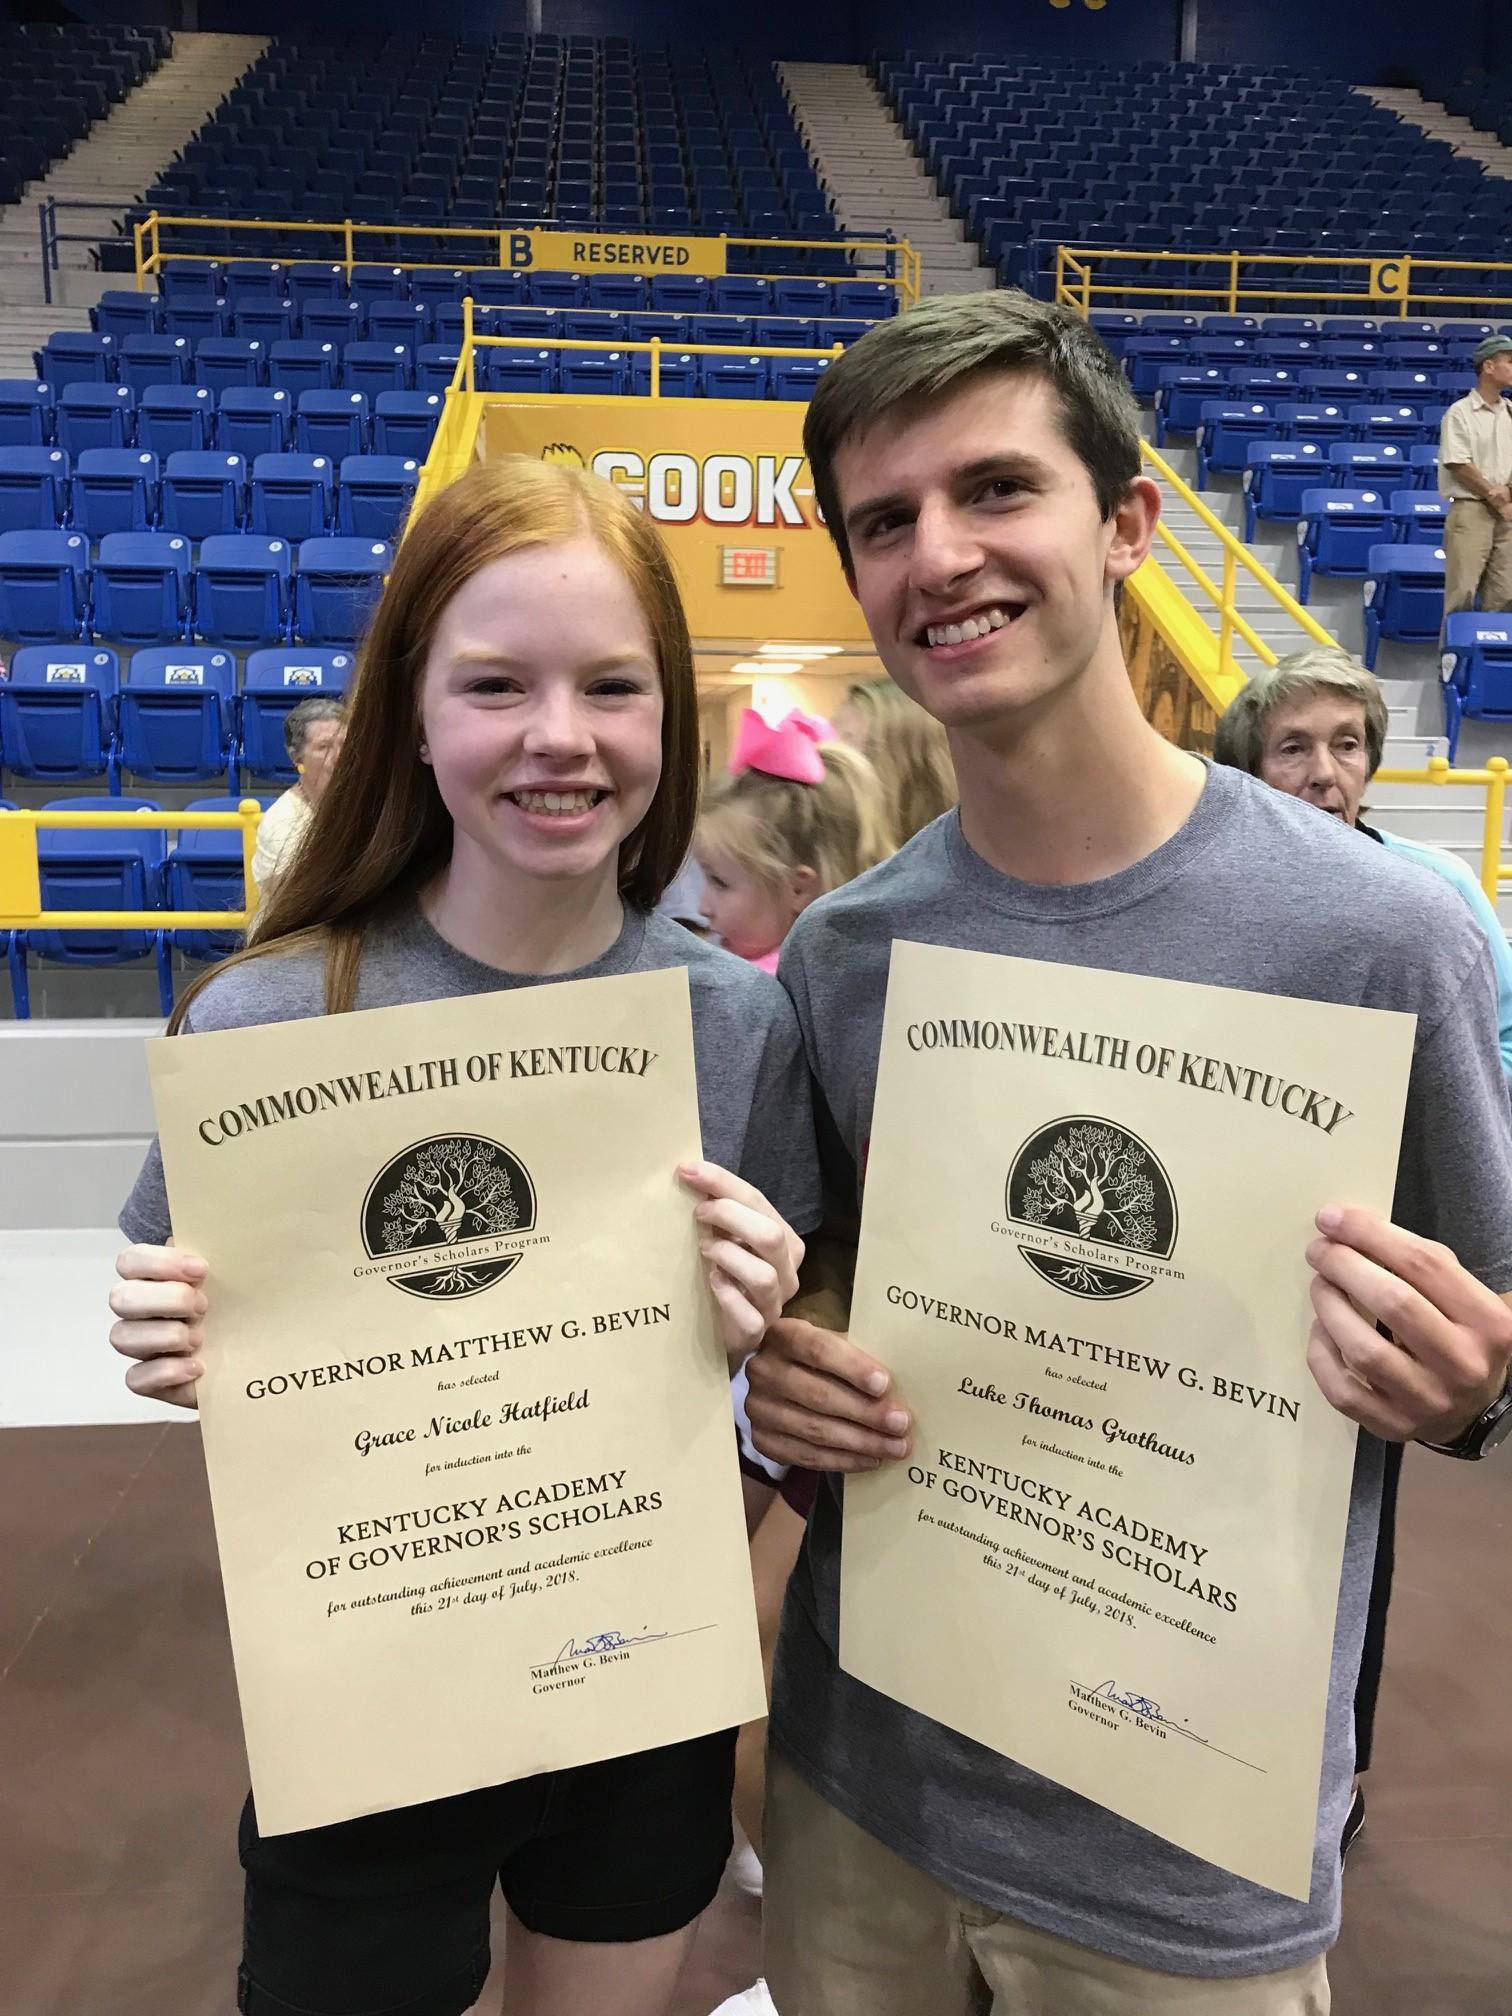 Grace Hatfield and Luke Grothaus at Morehead State University